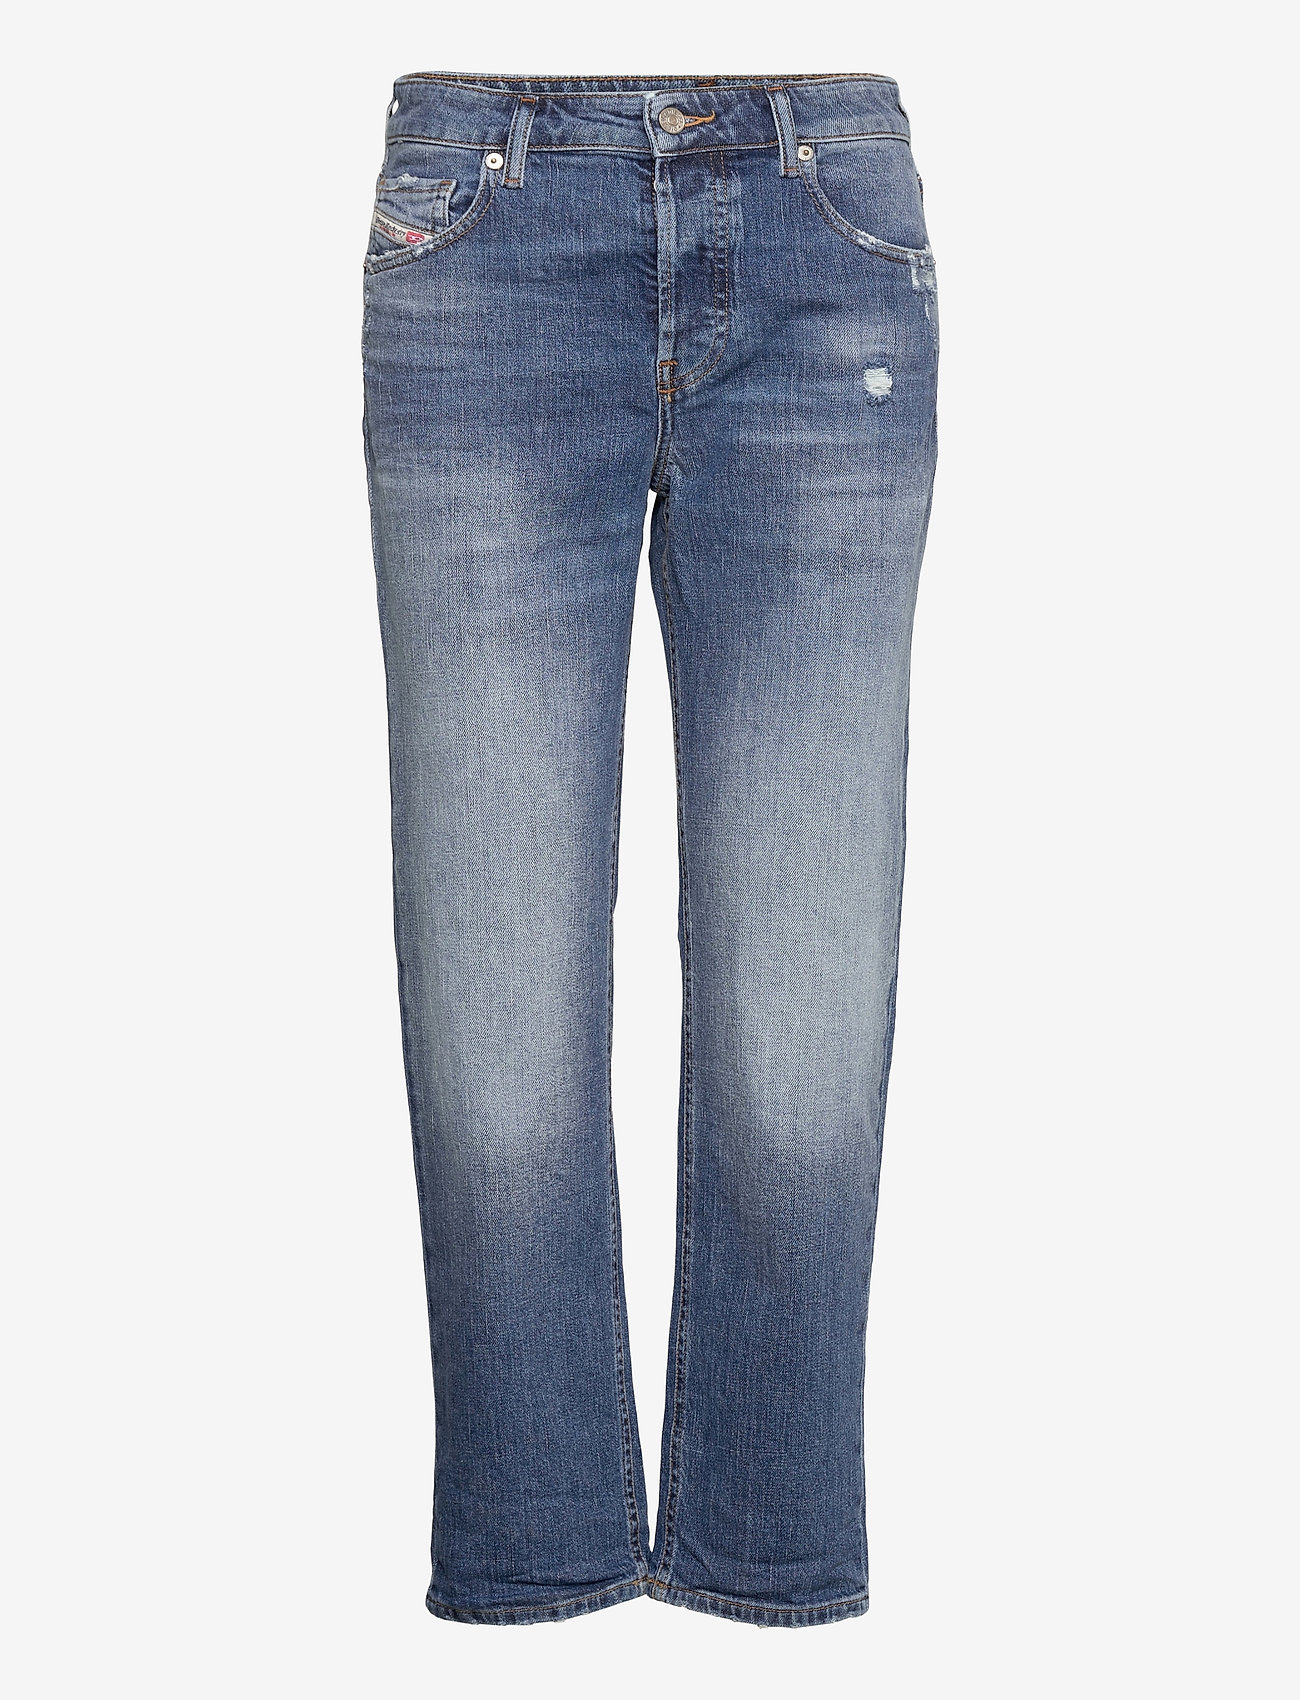 Diesel Women - D-ARYEL  L.34 TROUSERS - straight jeans - denim - 0